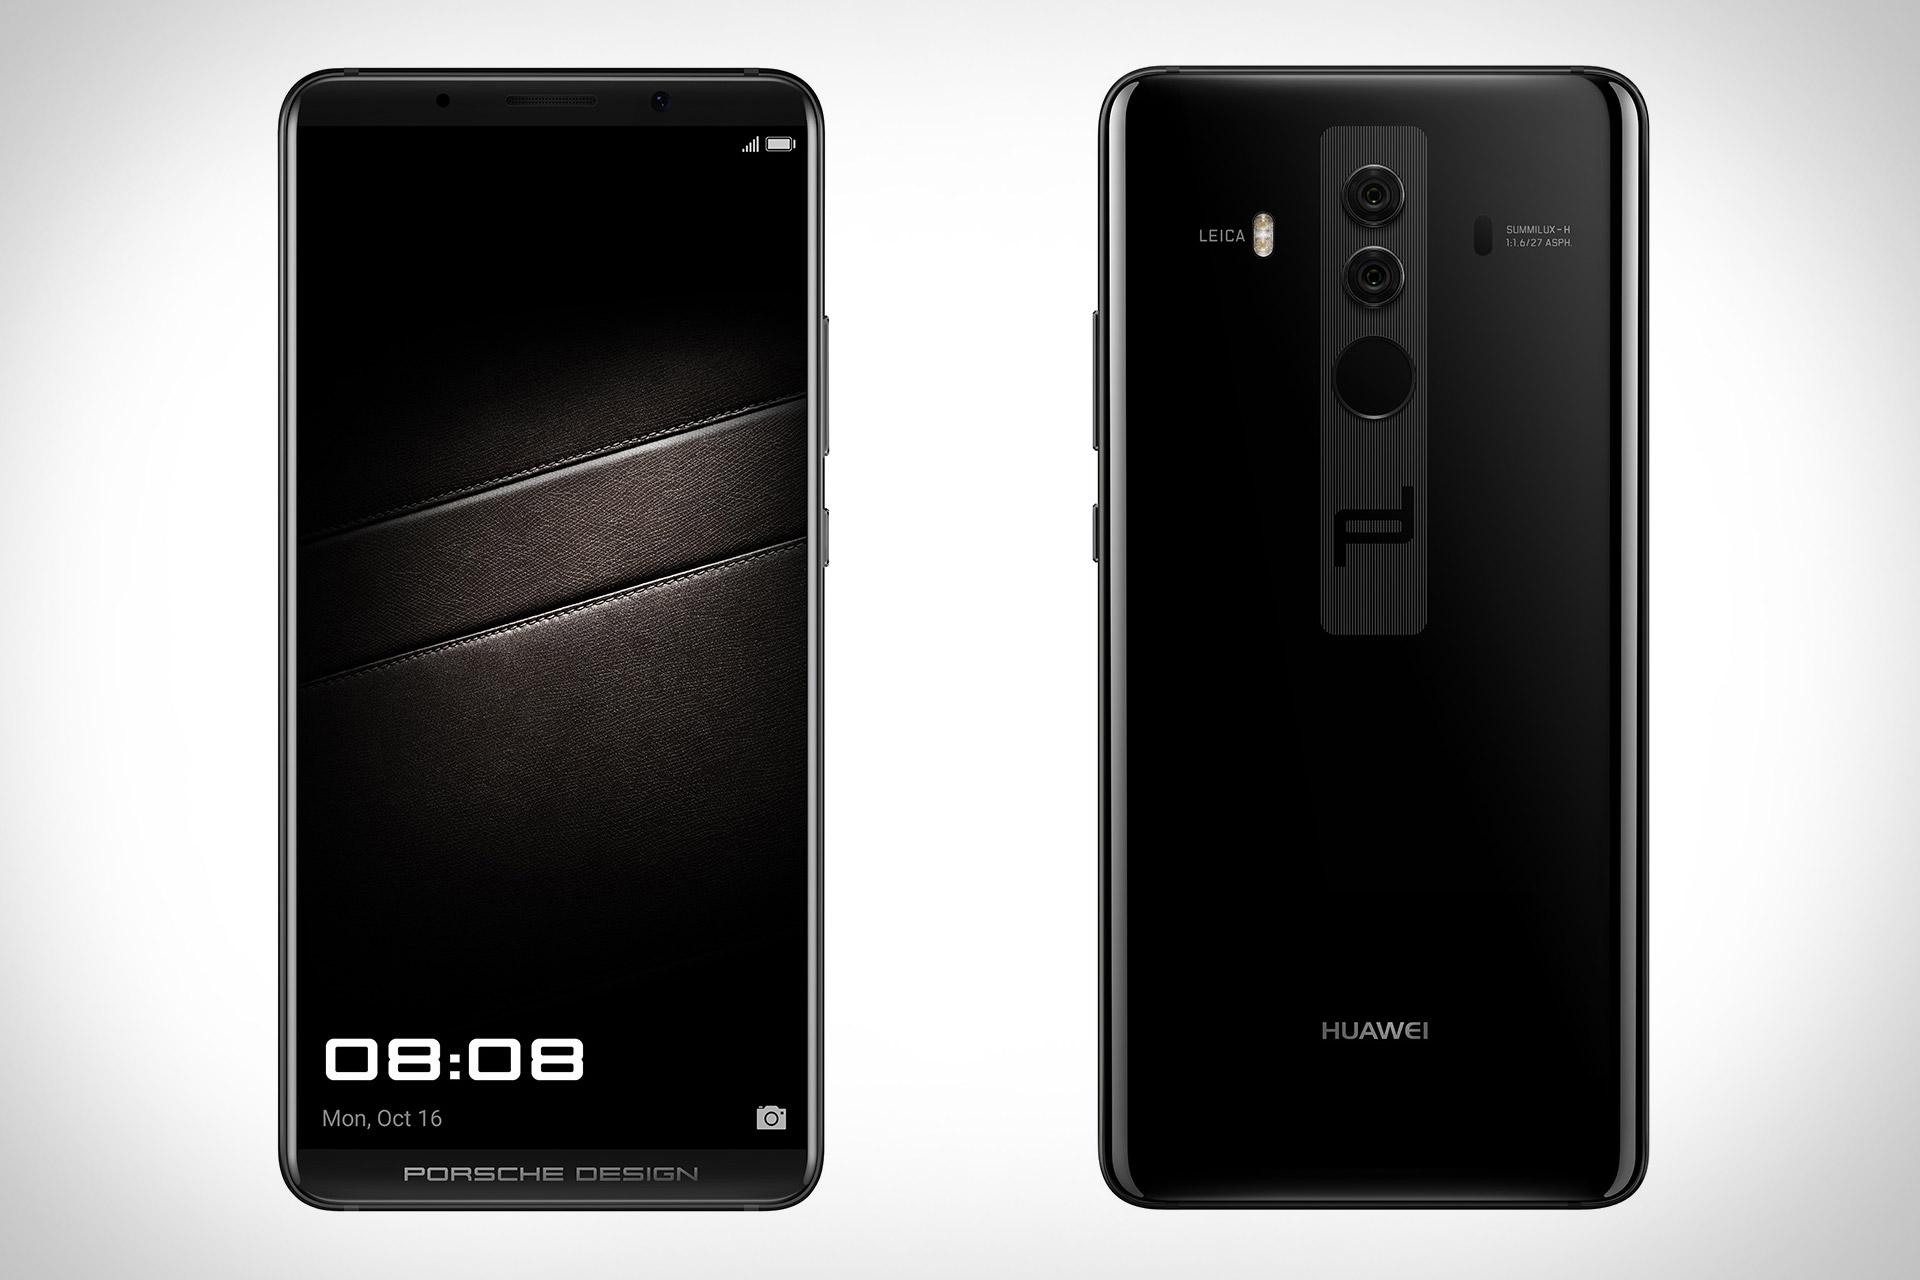 Huawei x Porsche Design Mate 10 Smartphone